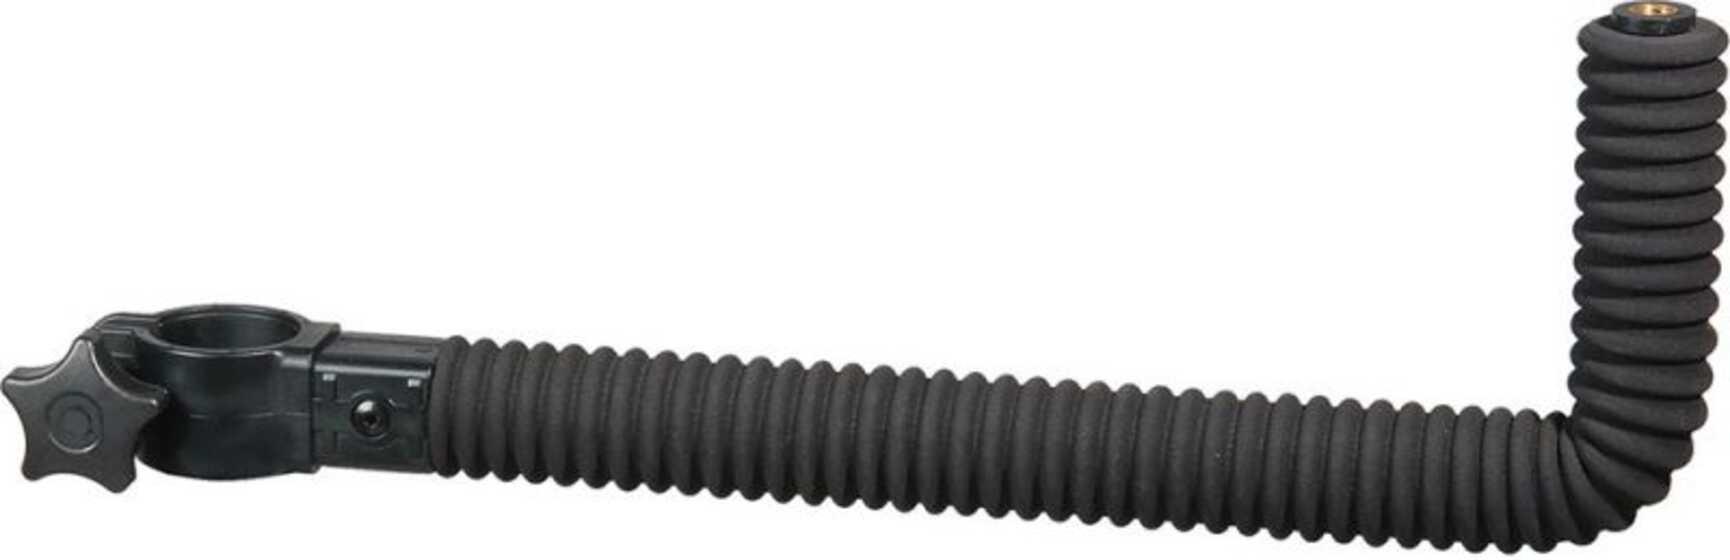 Trabucco Gnt-X36 Ripple Cross Arm